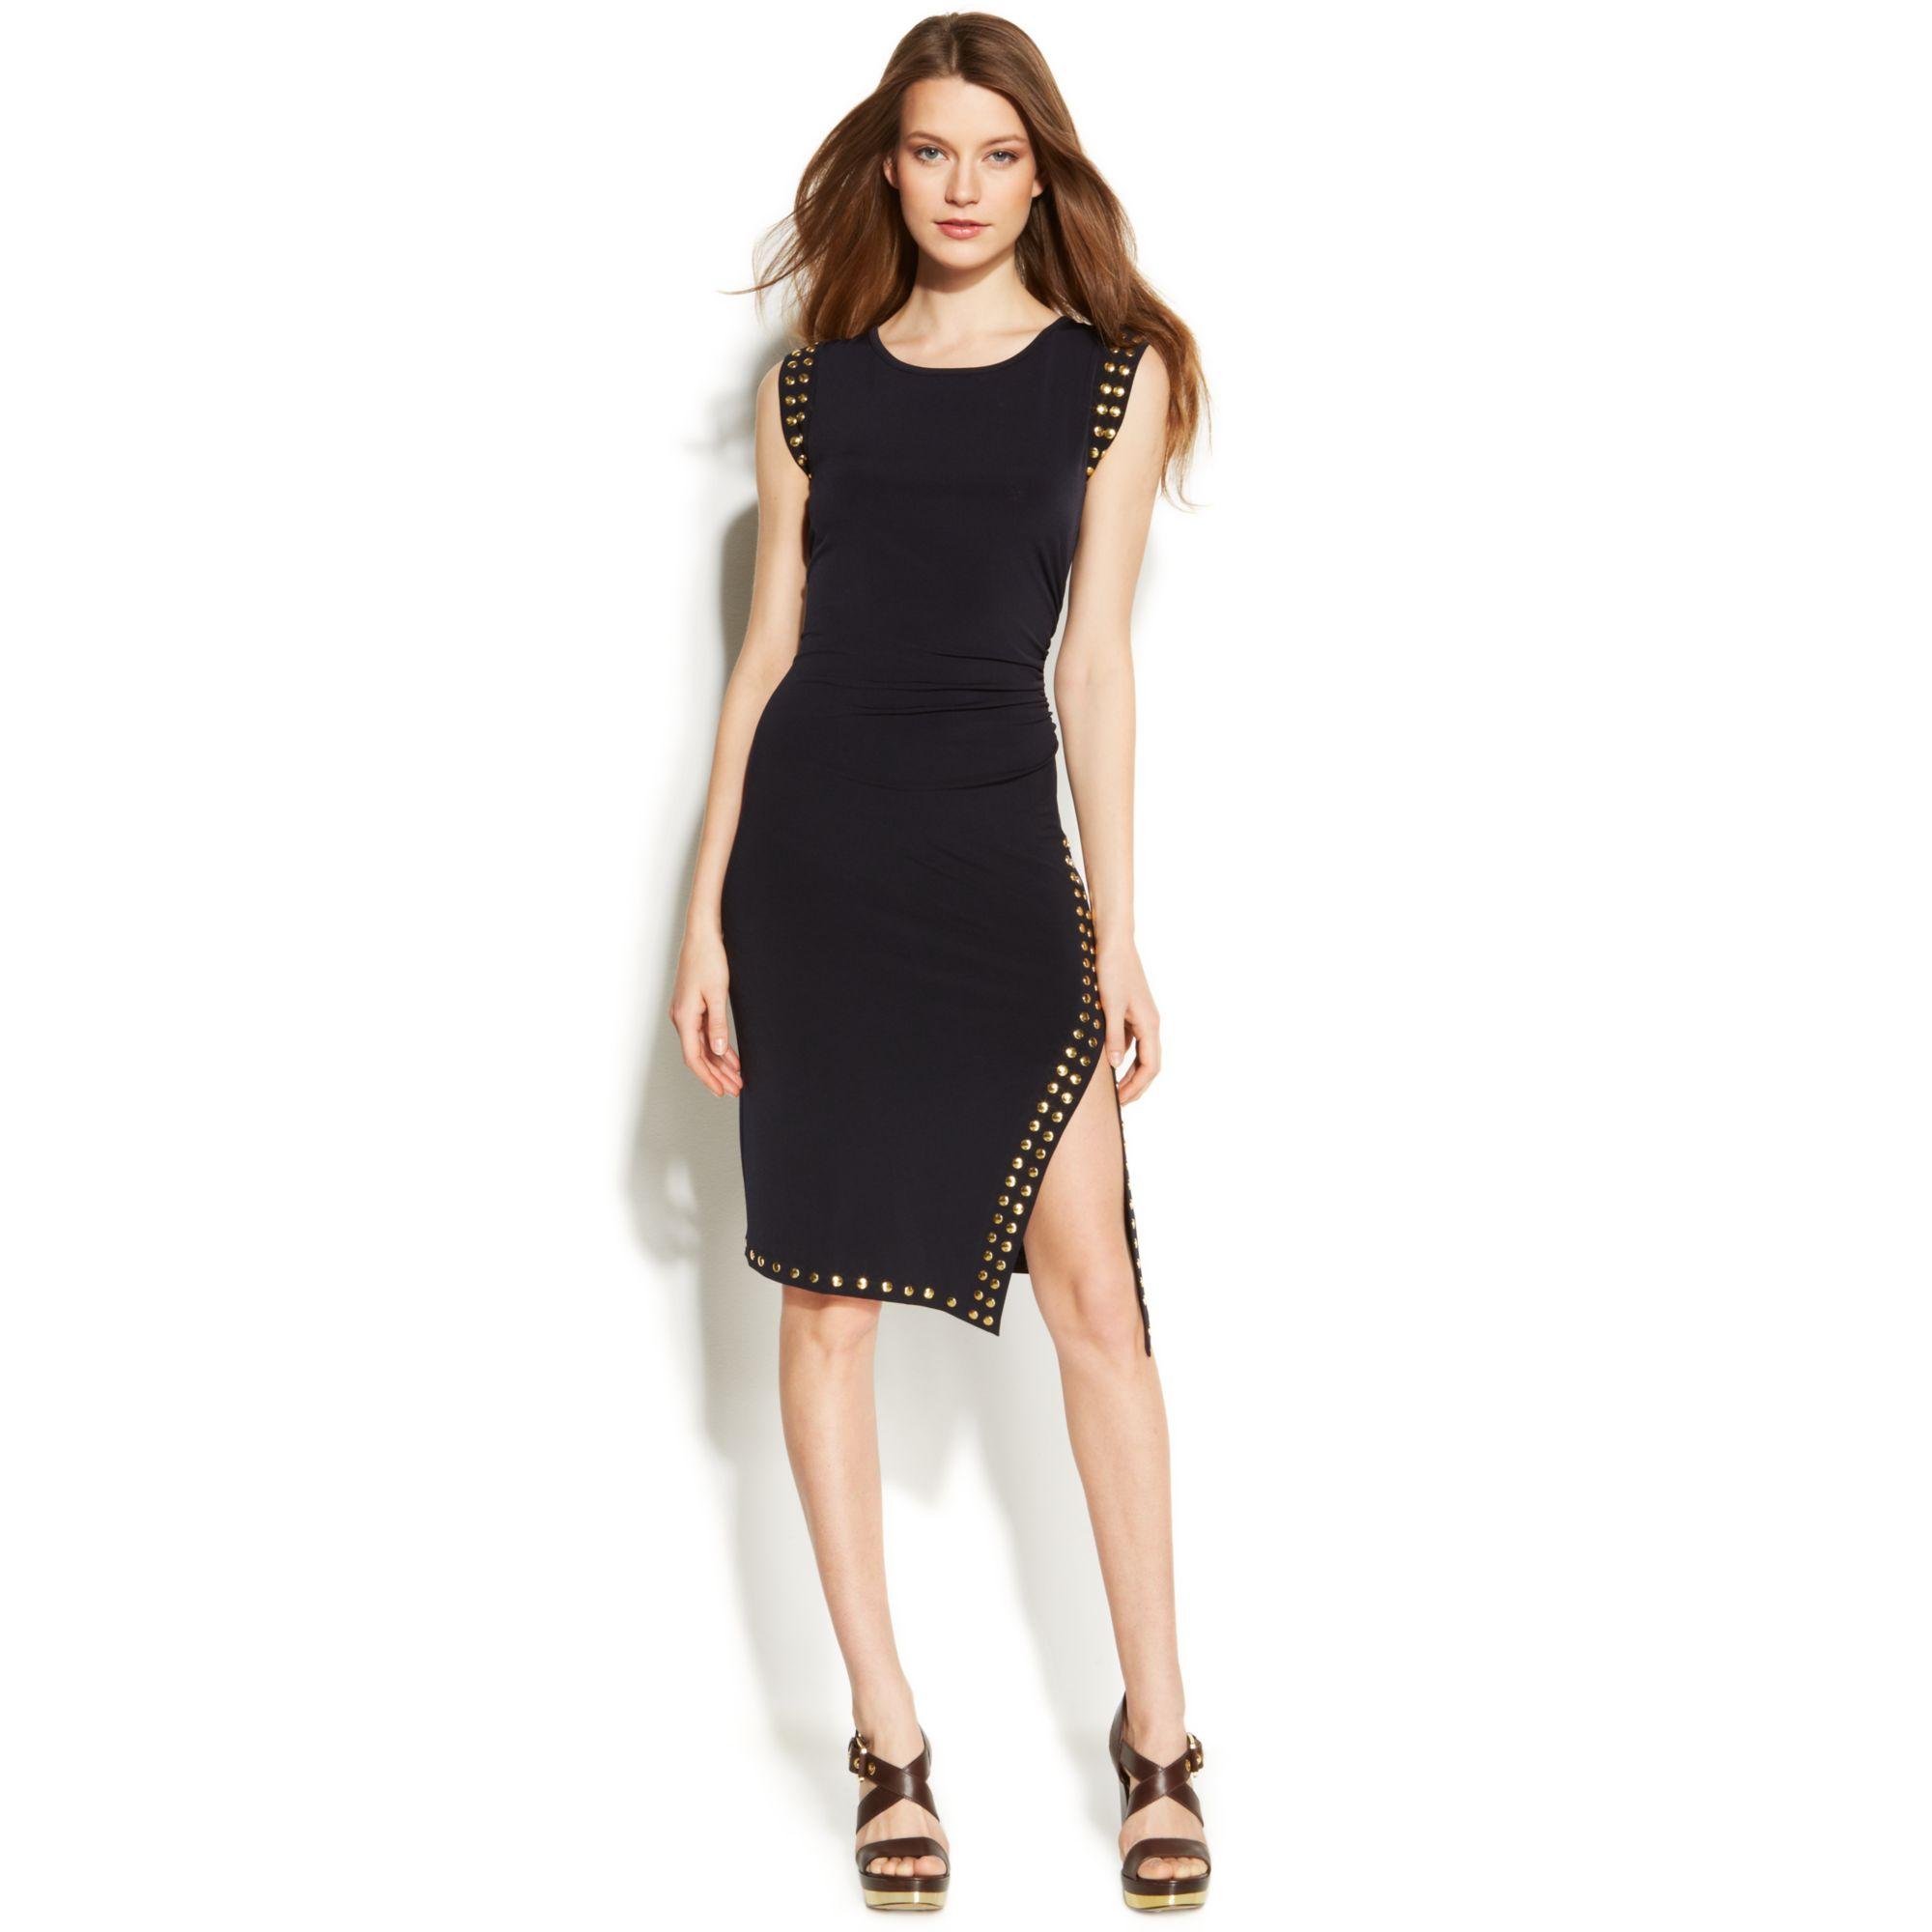 Creative Michael Kors Michael Rolled Sleeve Zip-Front Dress In Black | Lyst